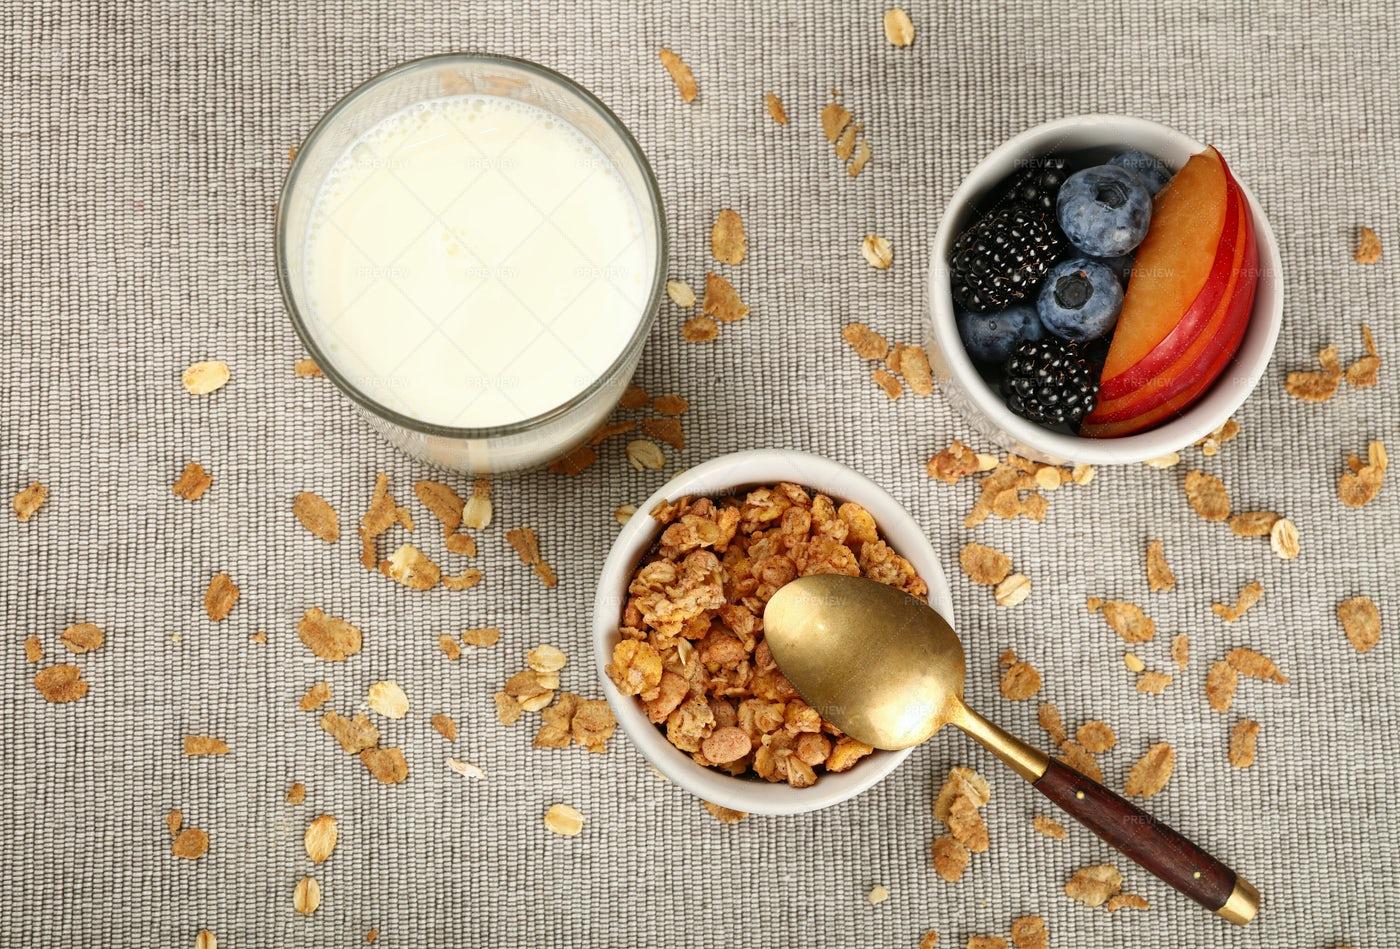 Muesli Granola Breakfast: Stock Photos